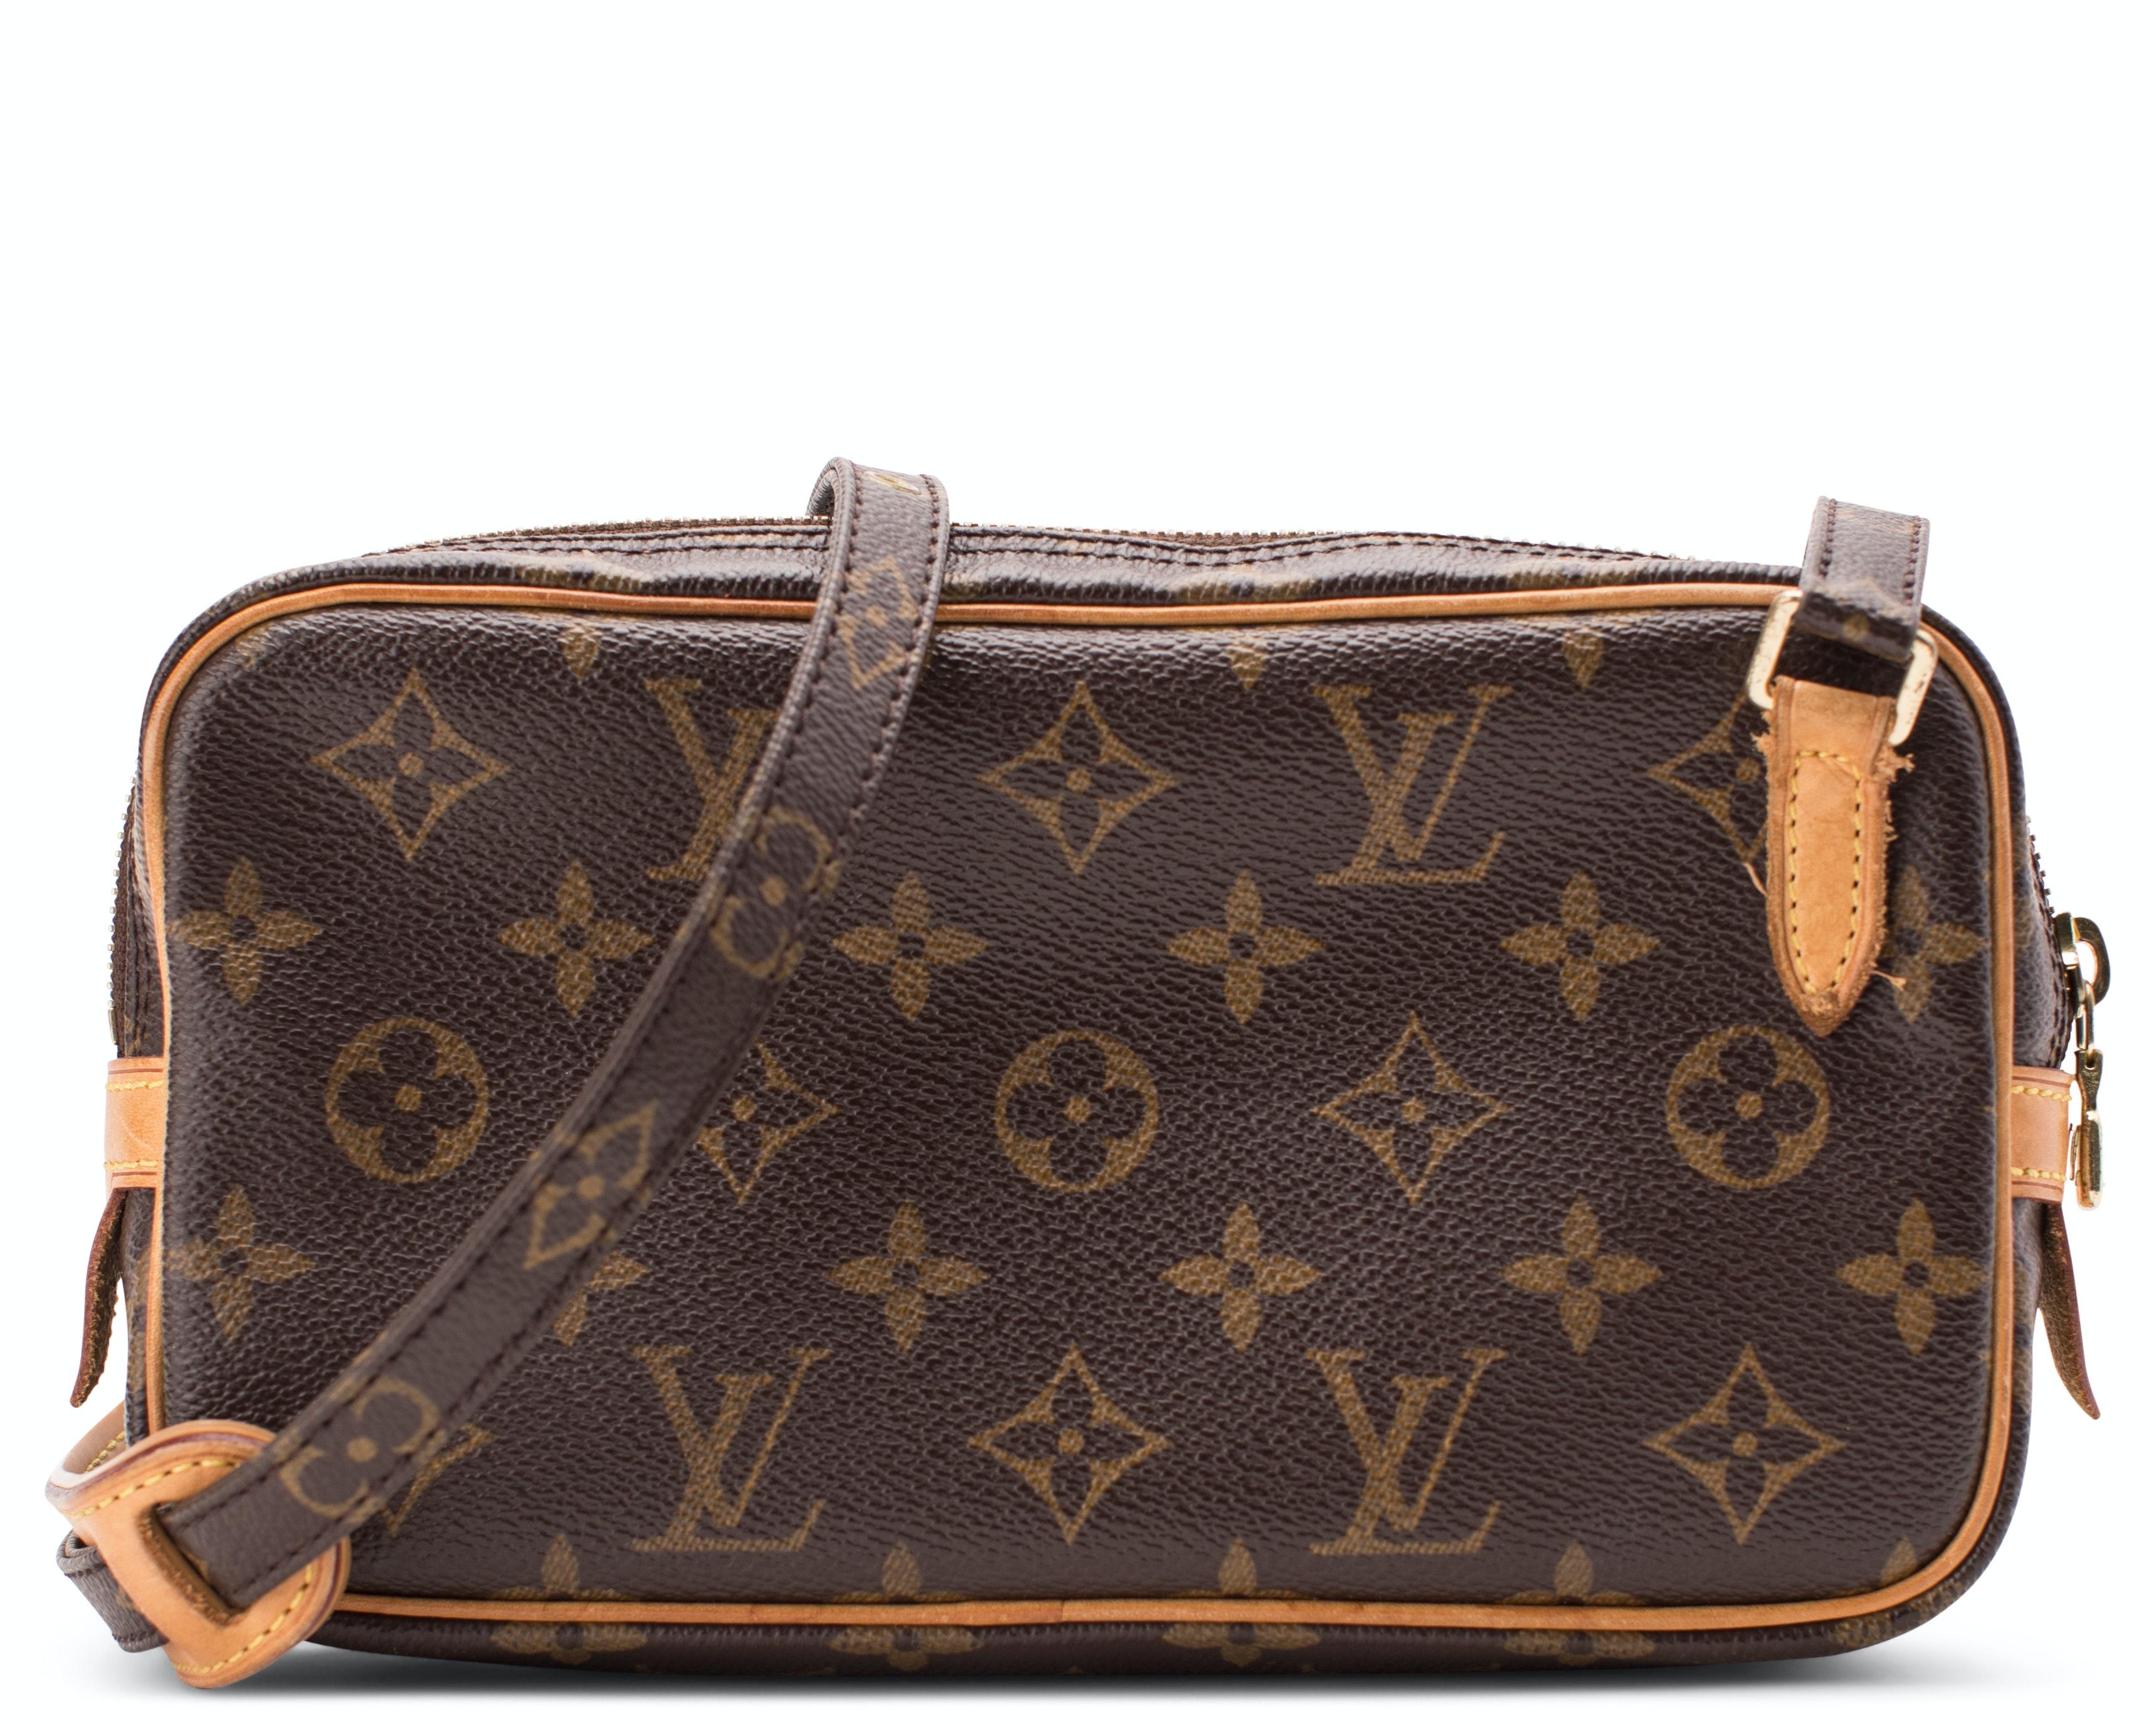 Louis Vuitton Marly Bandouliere Pochette Monogram Brown